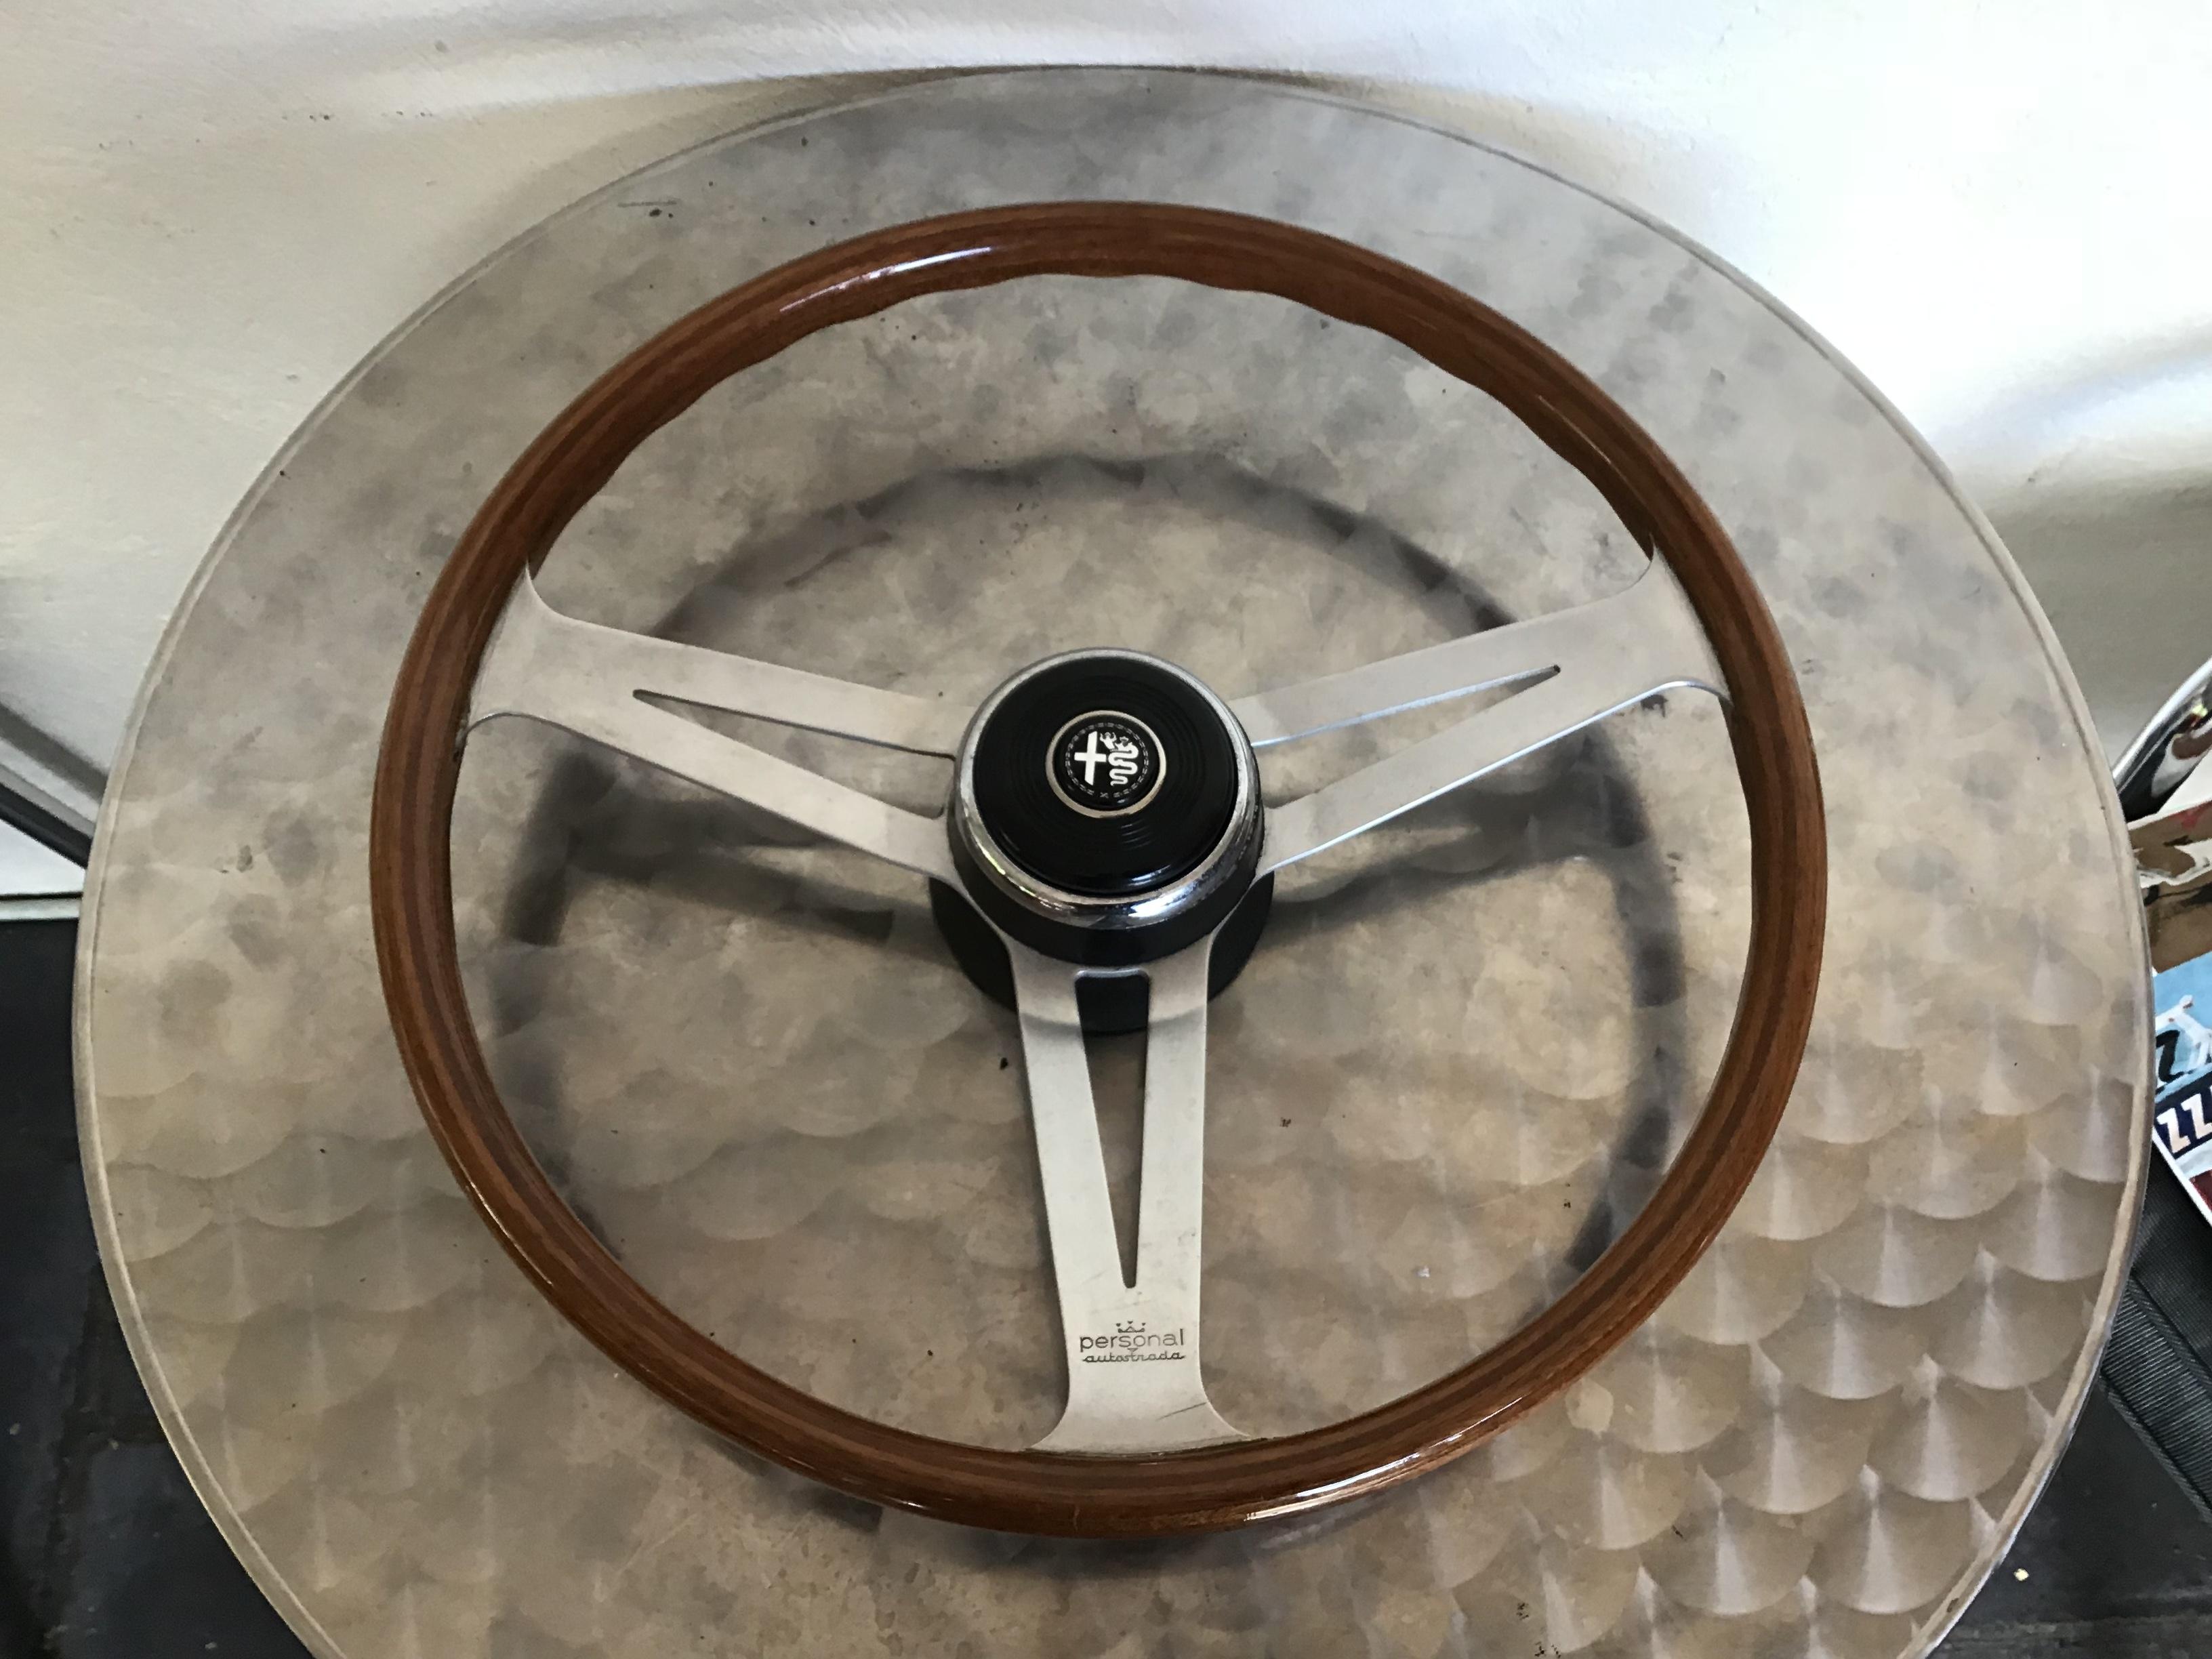 Picture of 1950 AlfaRomeo  1966 PERSONAL Factory  woodrim wheel For Sale